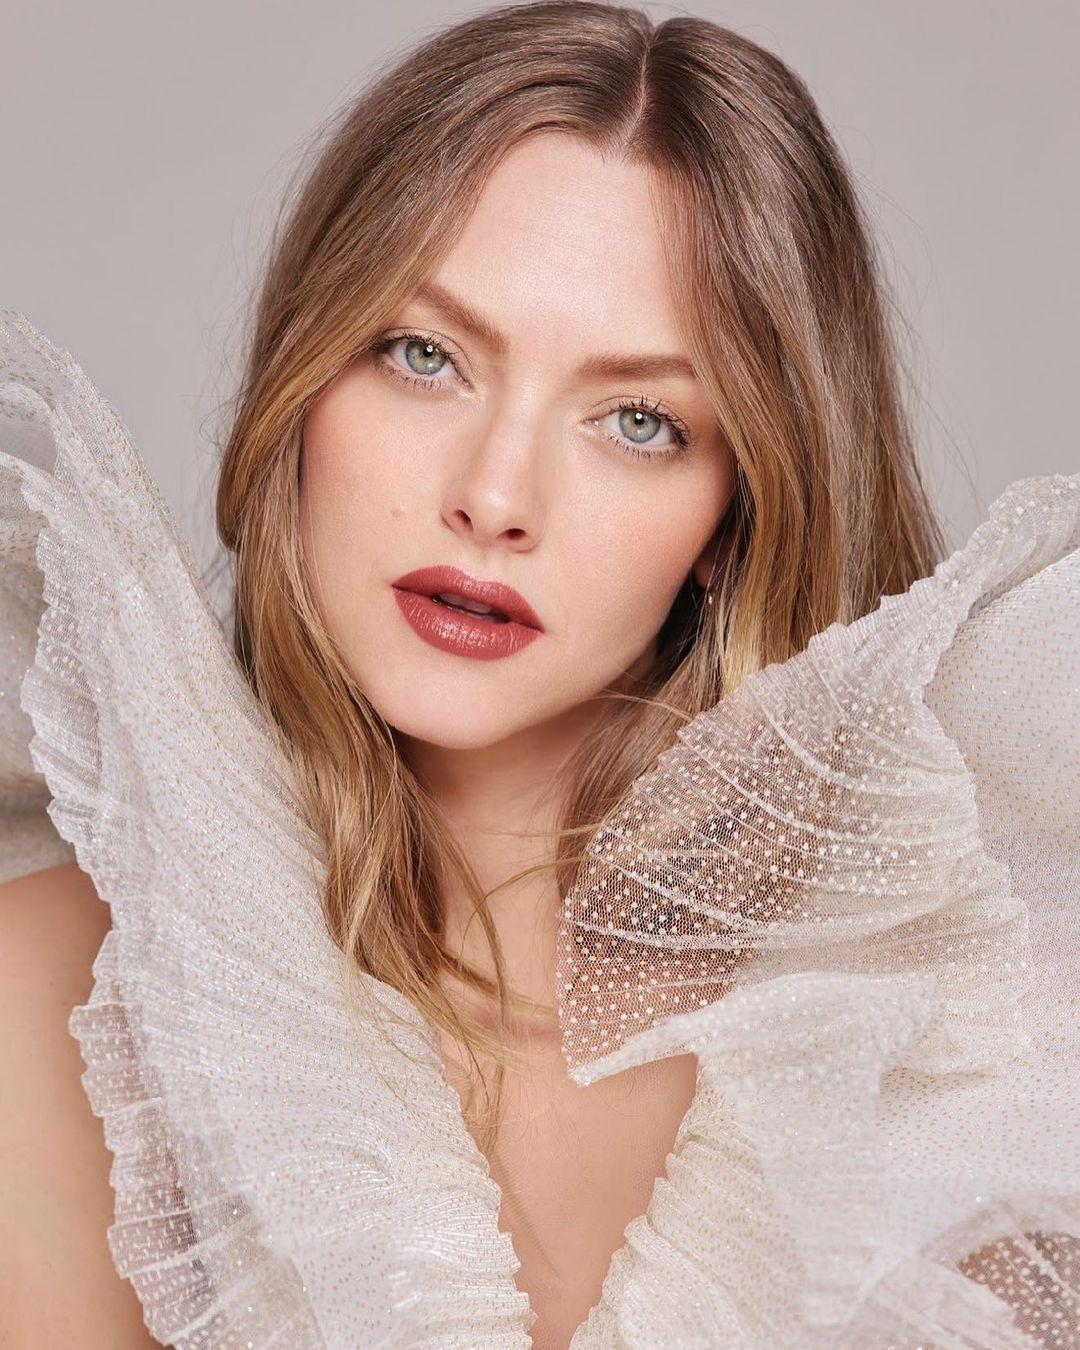 Amanda-Seyfried-Wallpapers-Insta-Fit-Bio-11